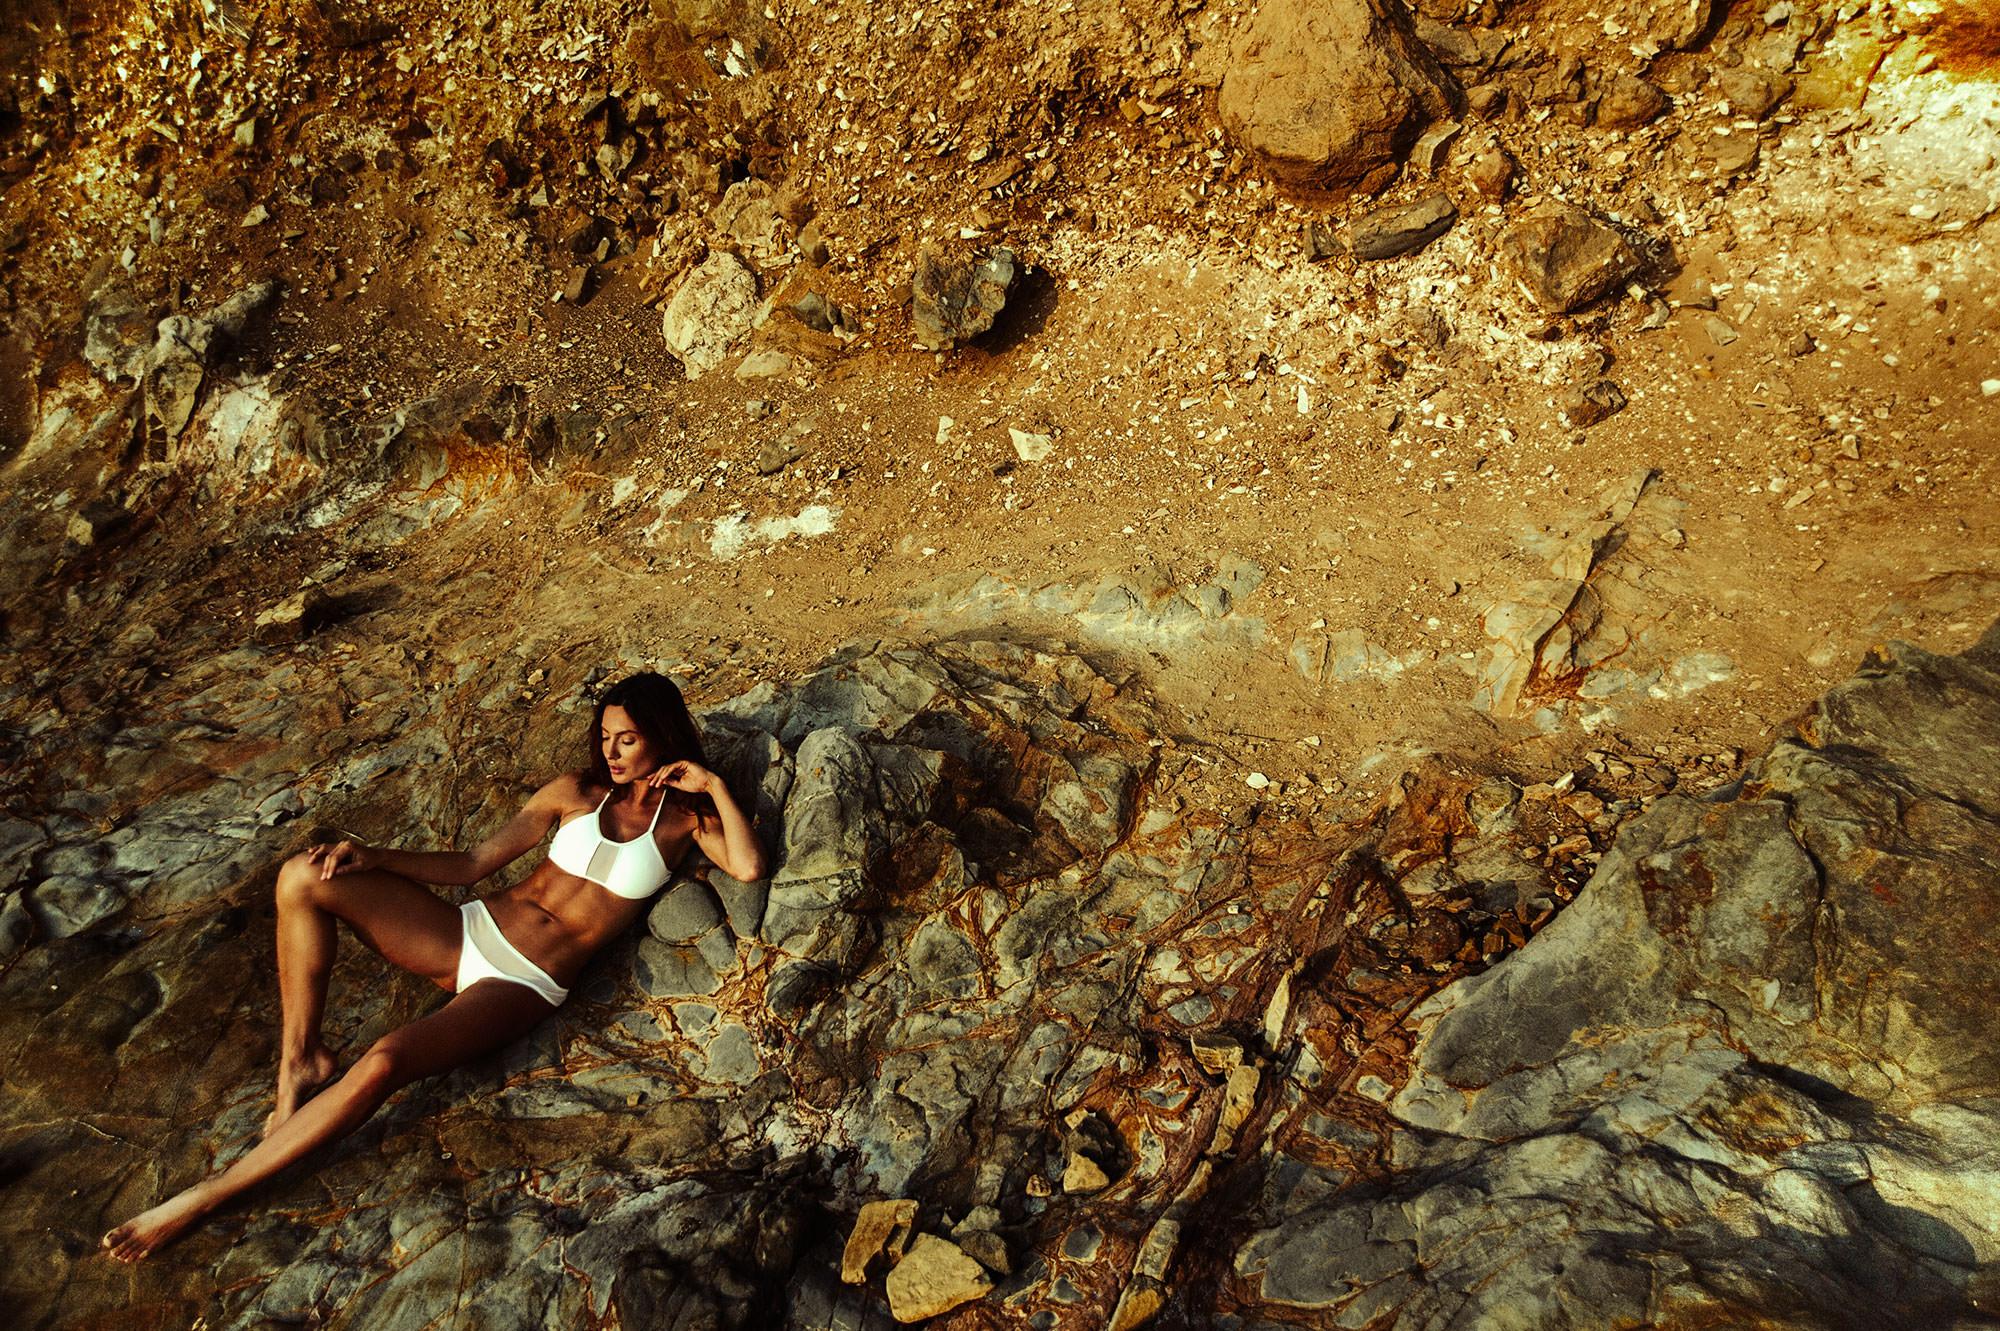 Palos-verde-paradise-cliff-with-oksana-rykova.jpg